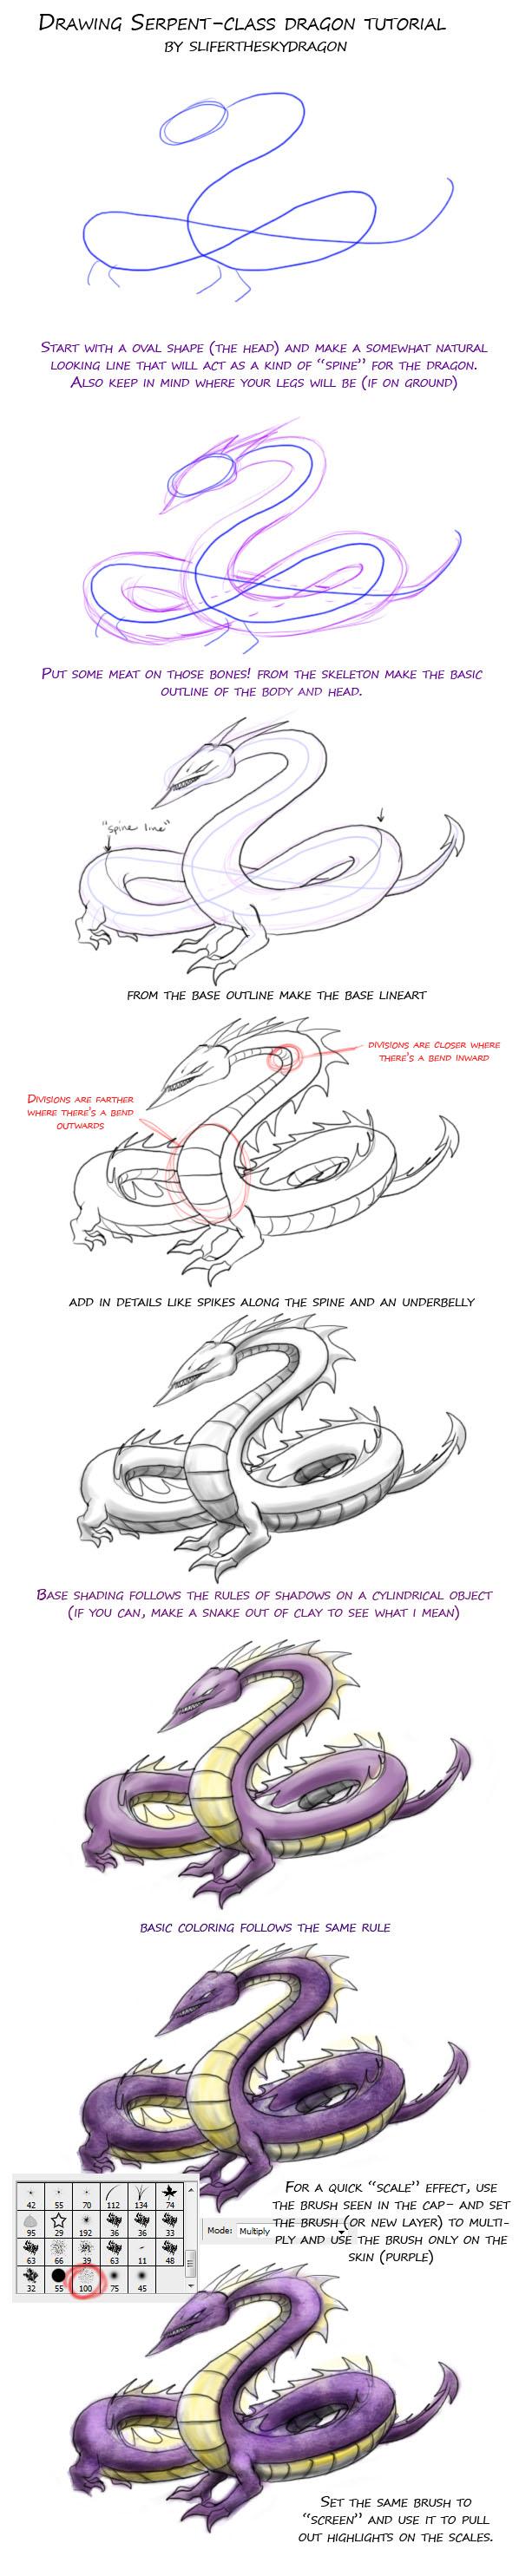 drawing snake type dragon TUT by slifertheskydragon